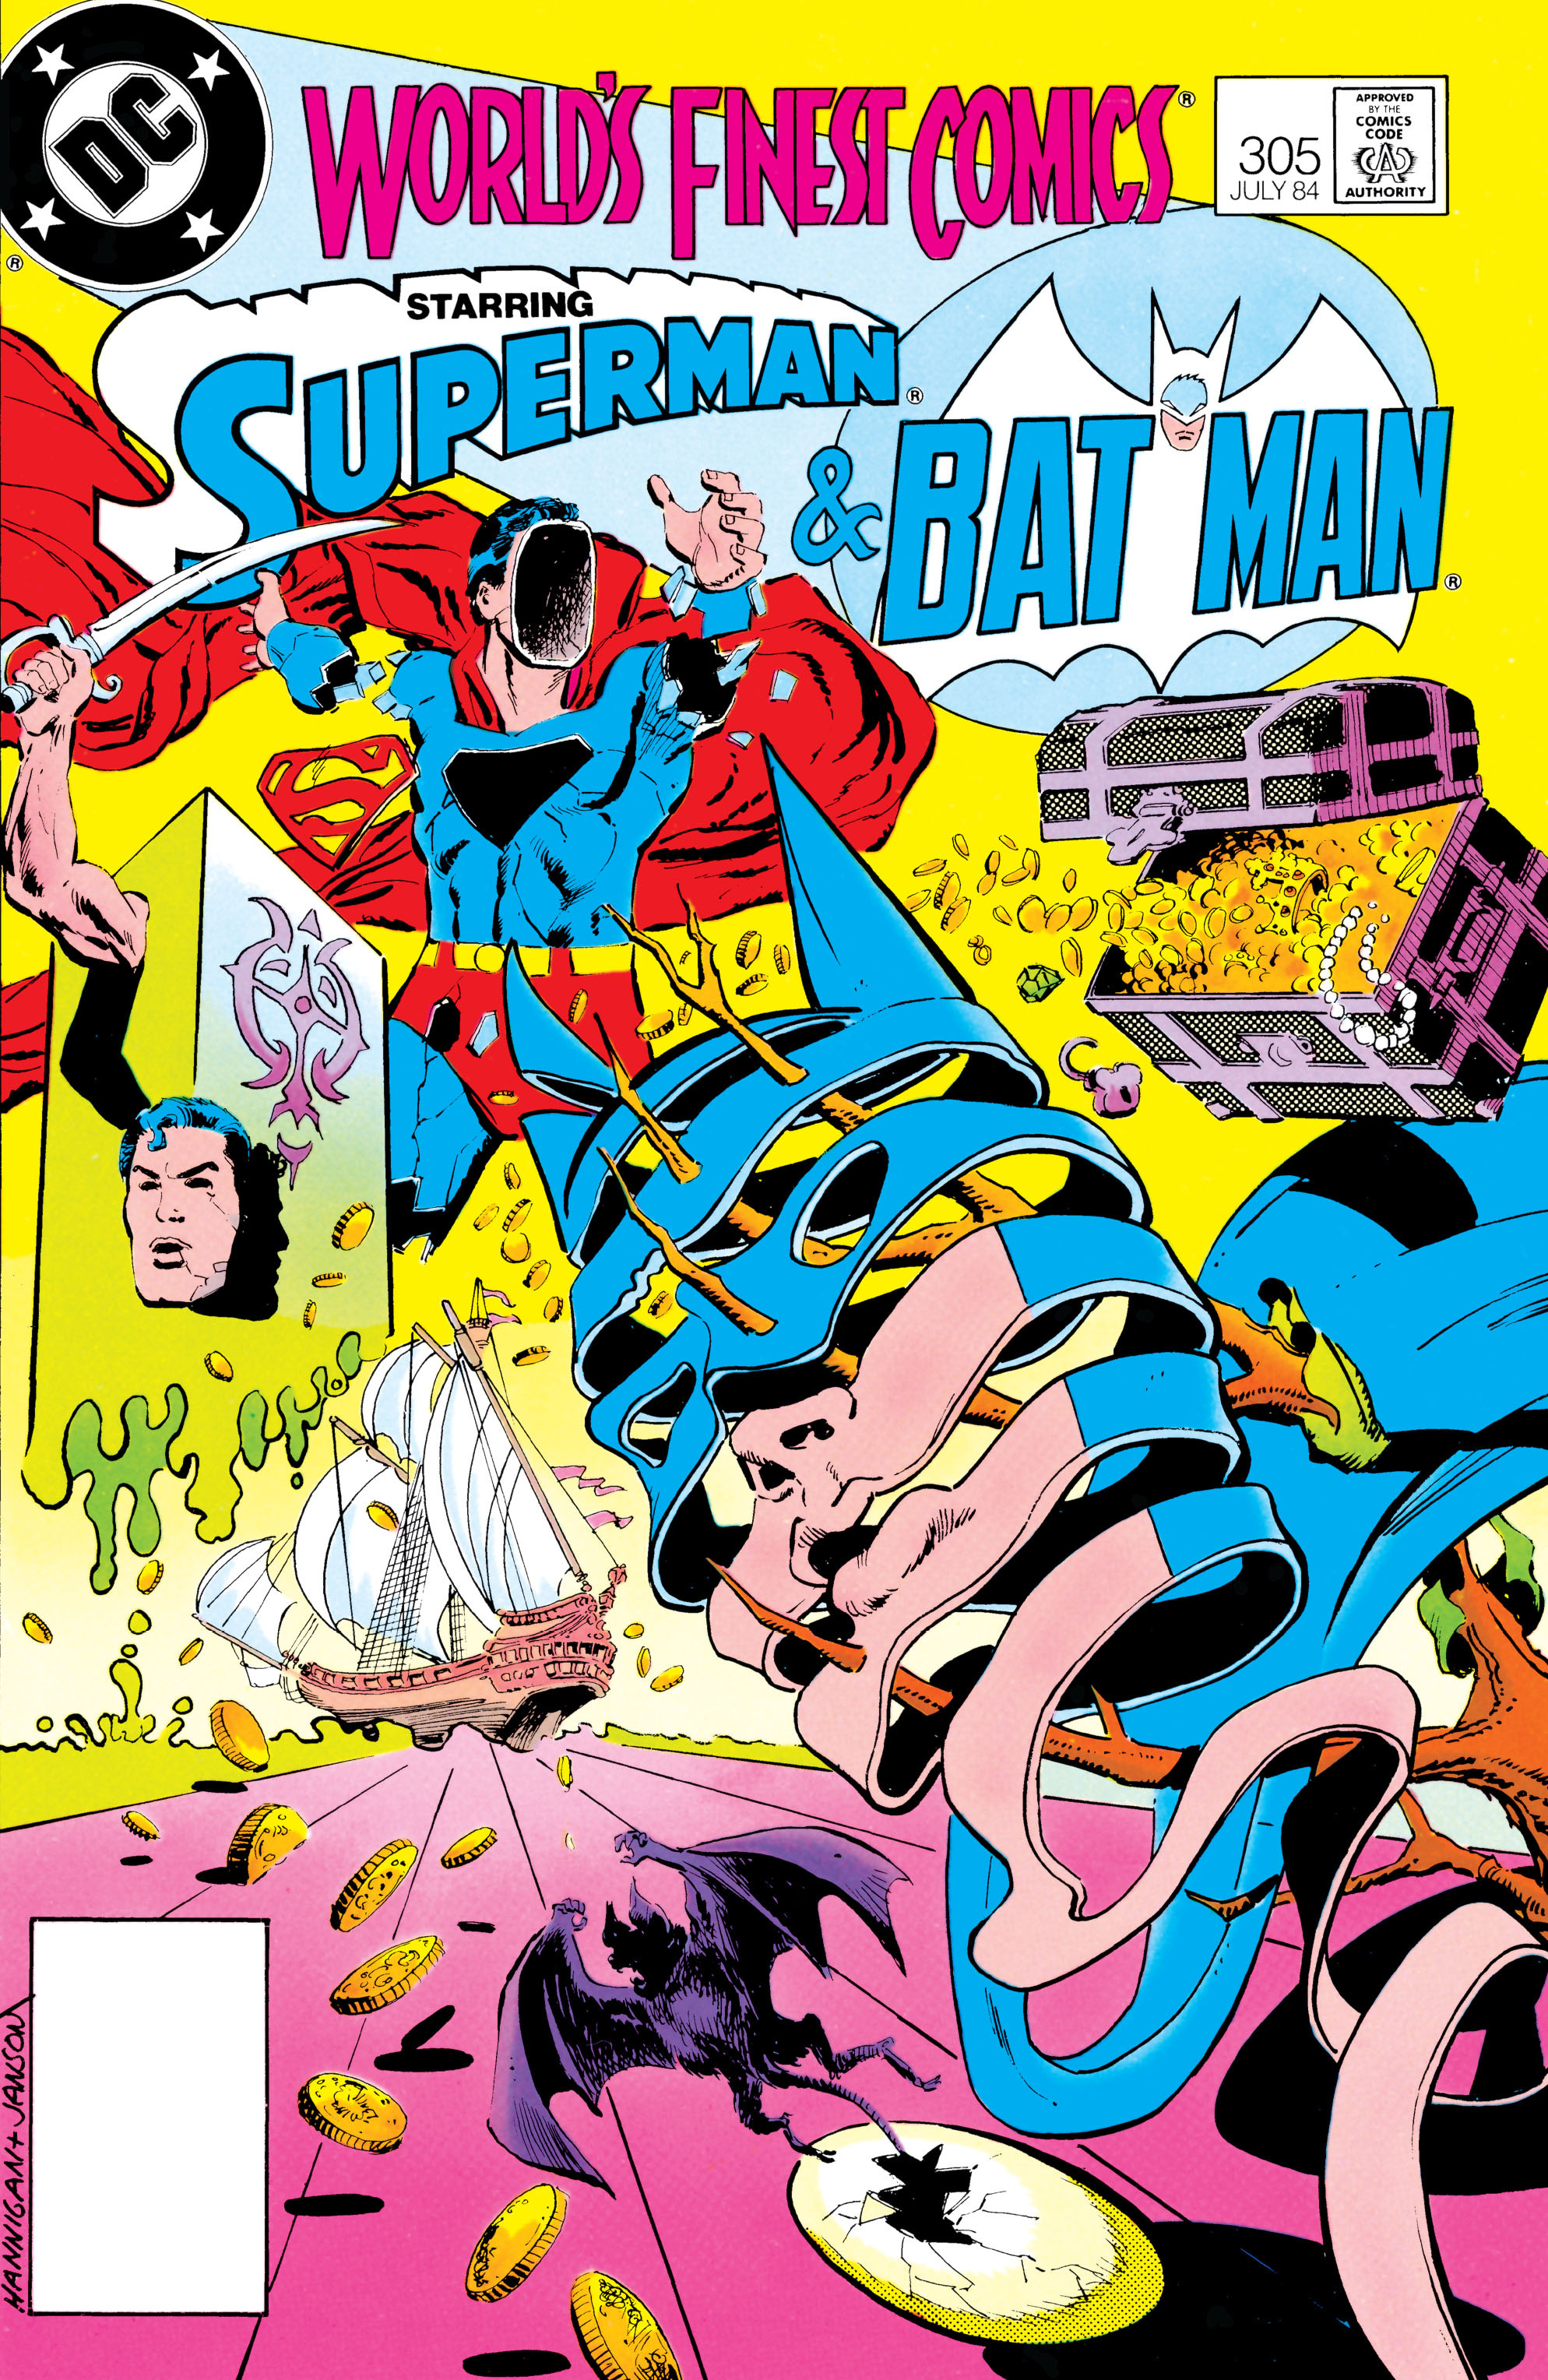 Read online World's Finest Comics comic -  Issue #305 - 1